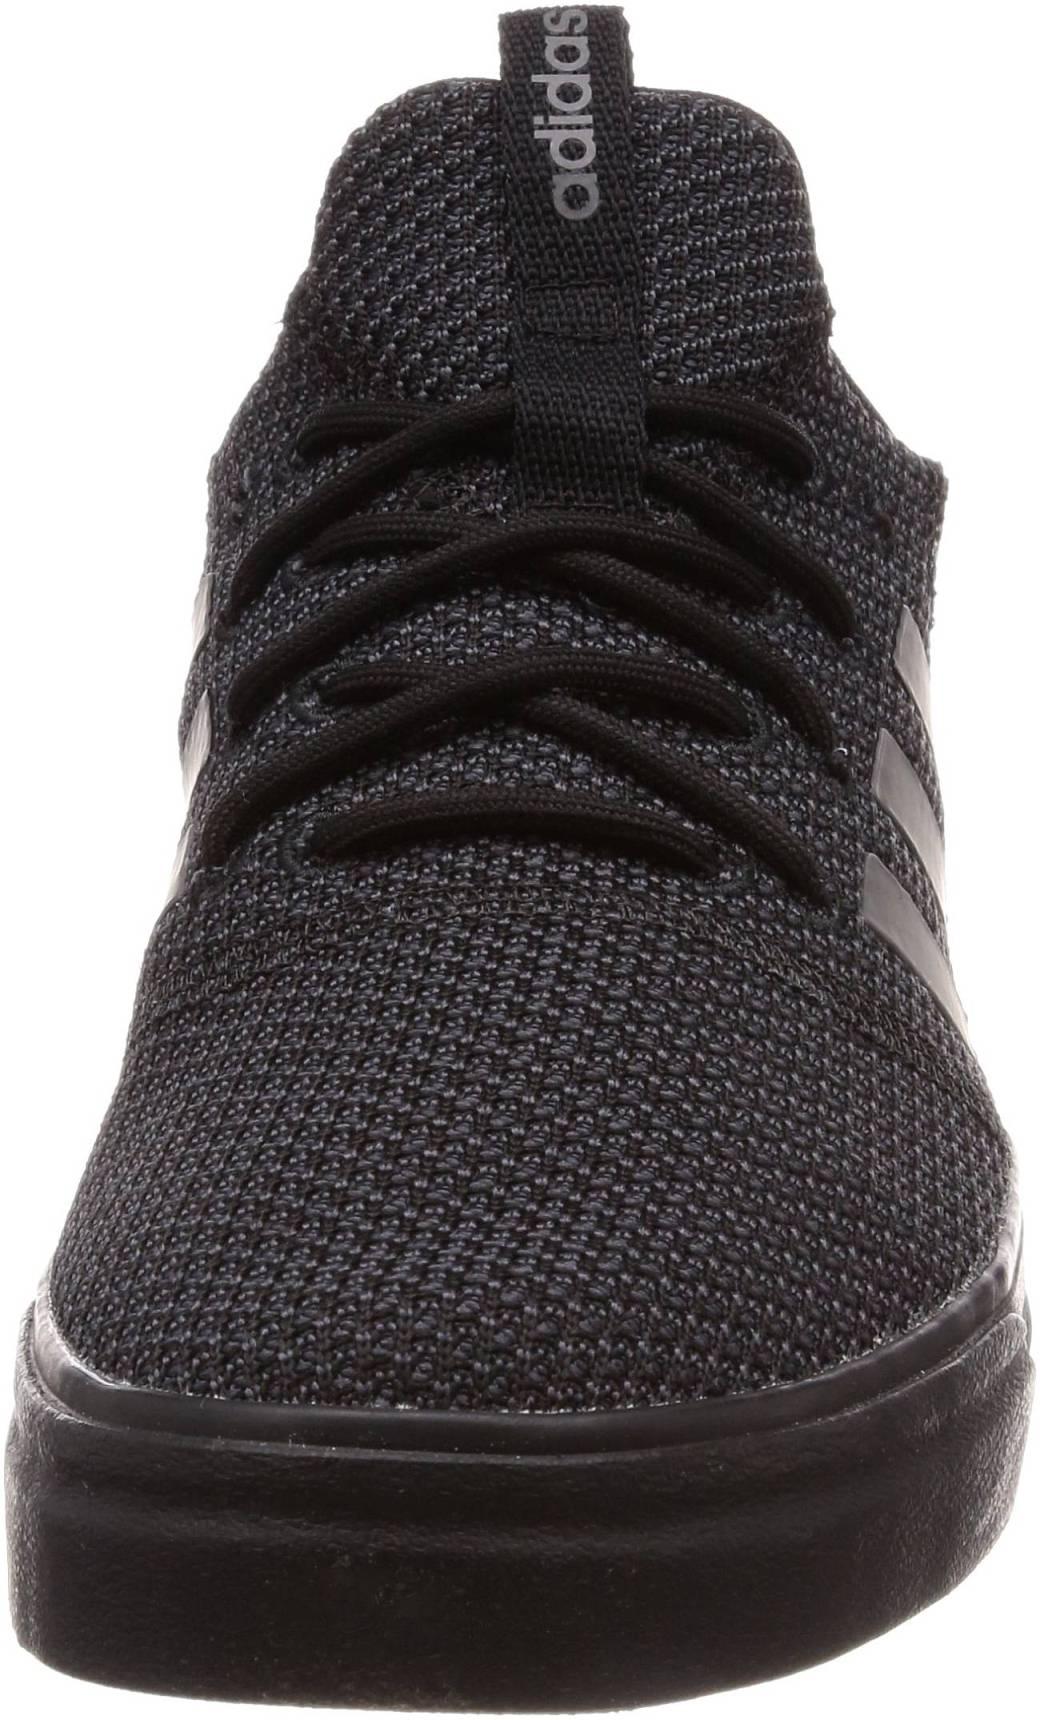 Adidas True Street – Shoes Reviews & Reasons To Buy